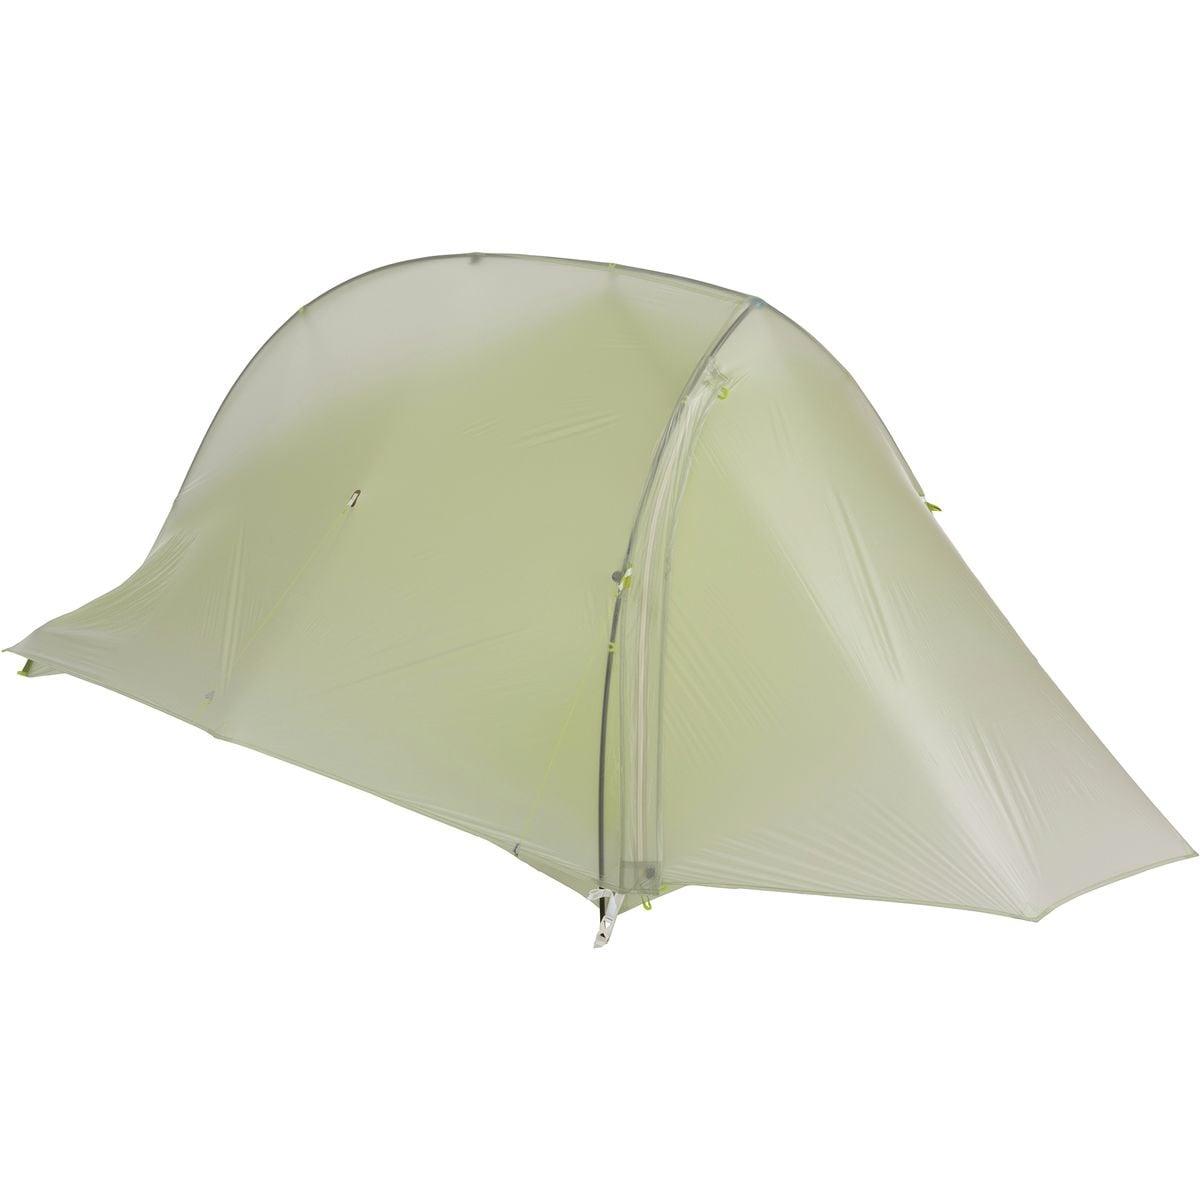 Big Agnes Fly Creek 1 Platinum HV Tent: 1-Person 3-Season